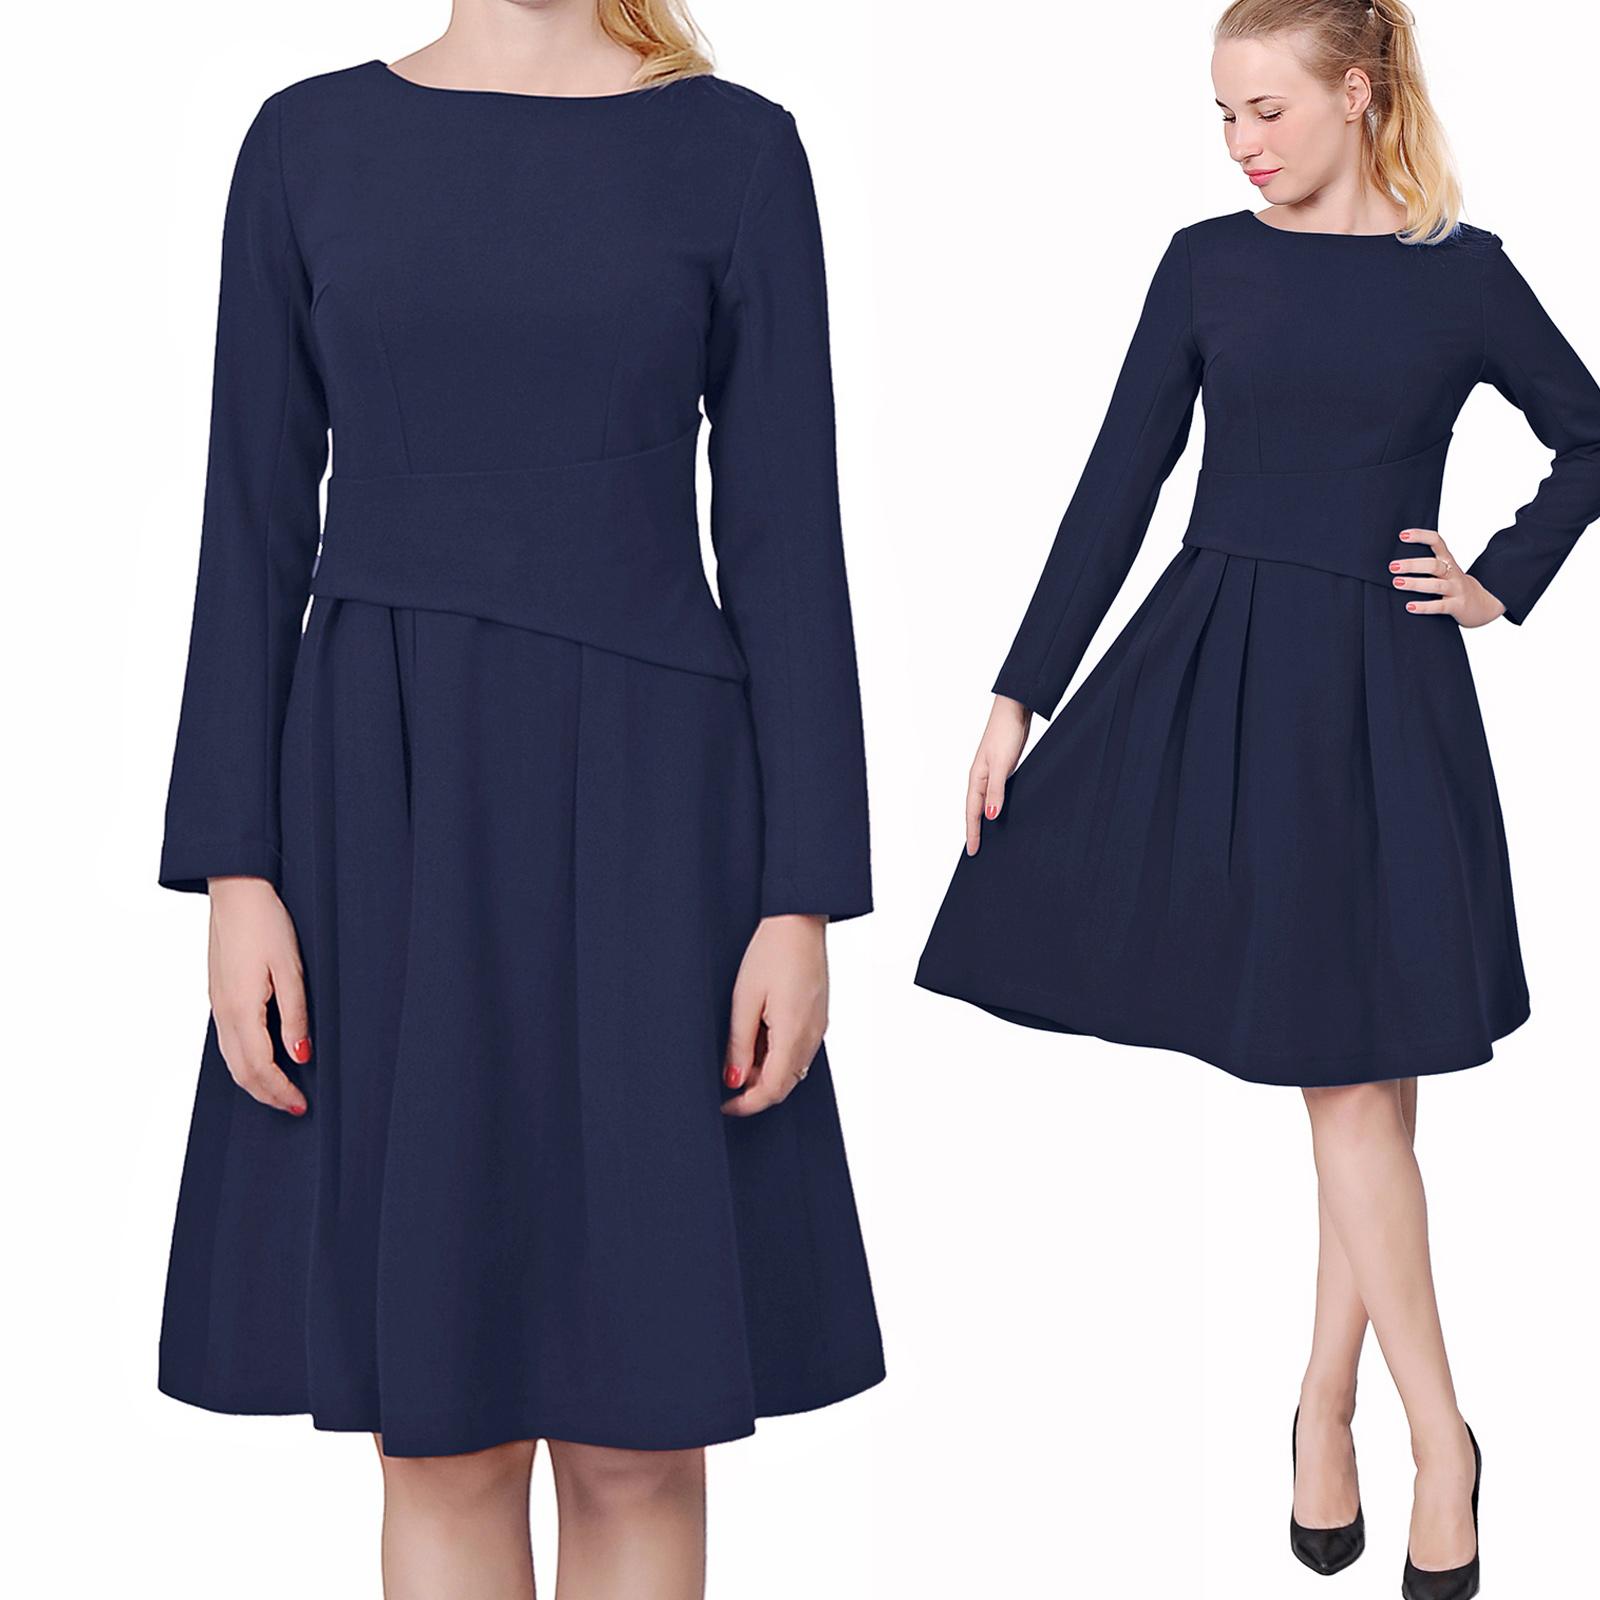 Black dress retro - Women 039 S Elegant Wear To Work Dress